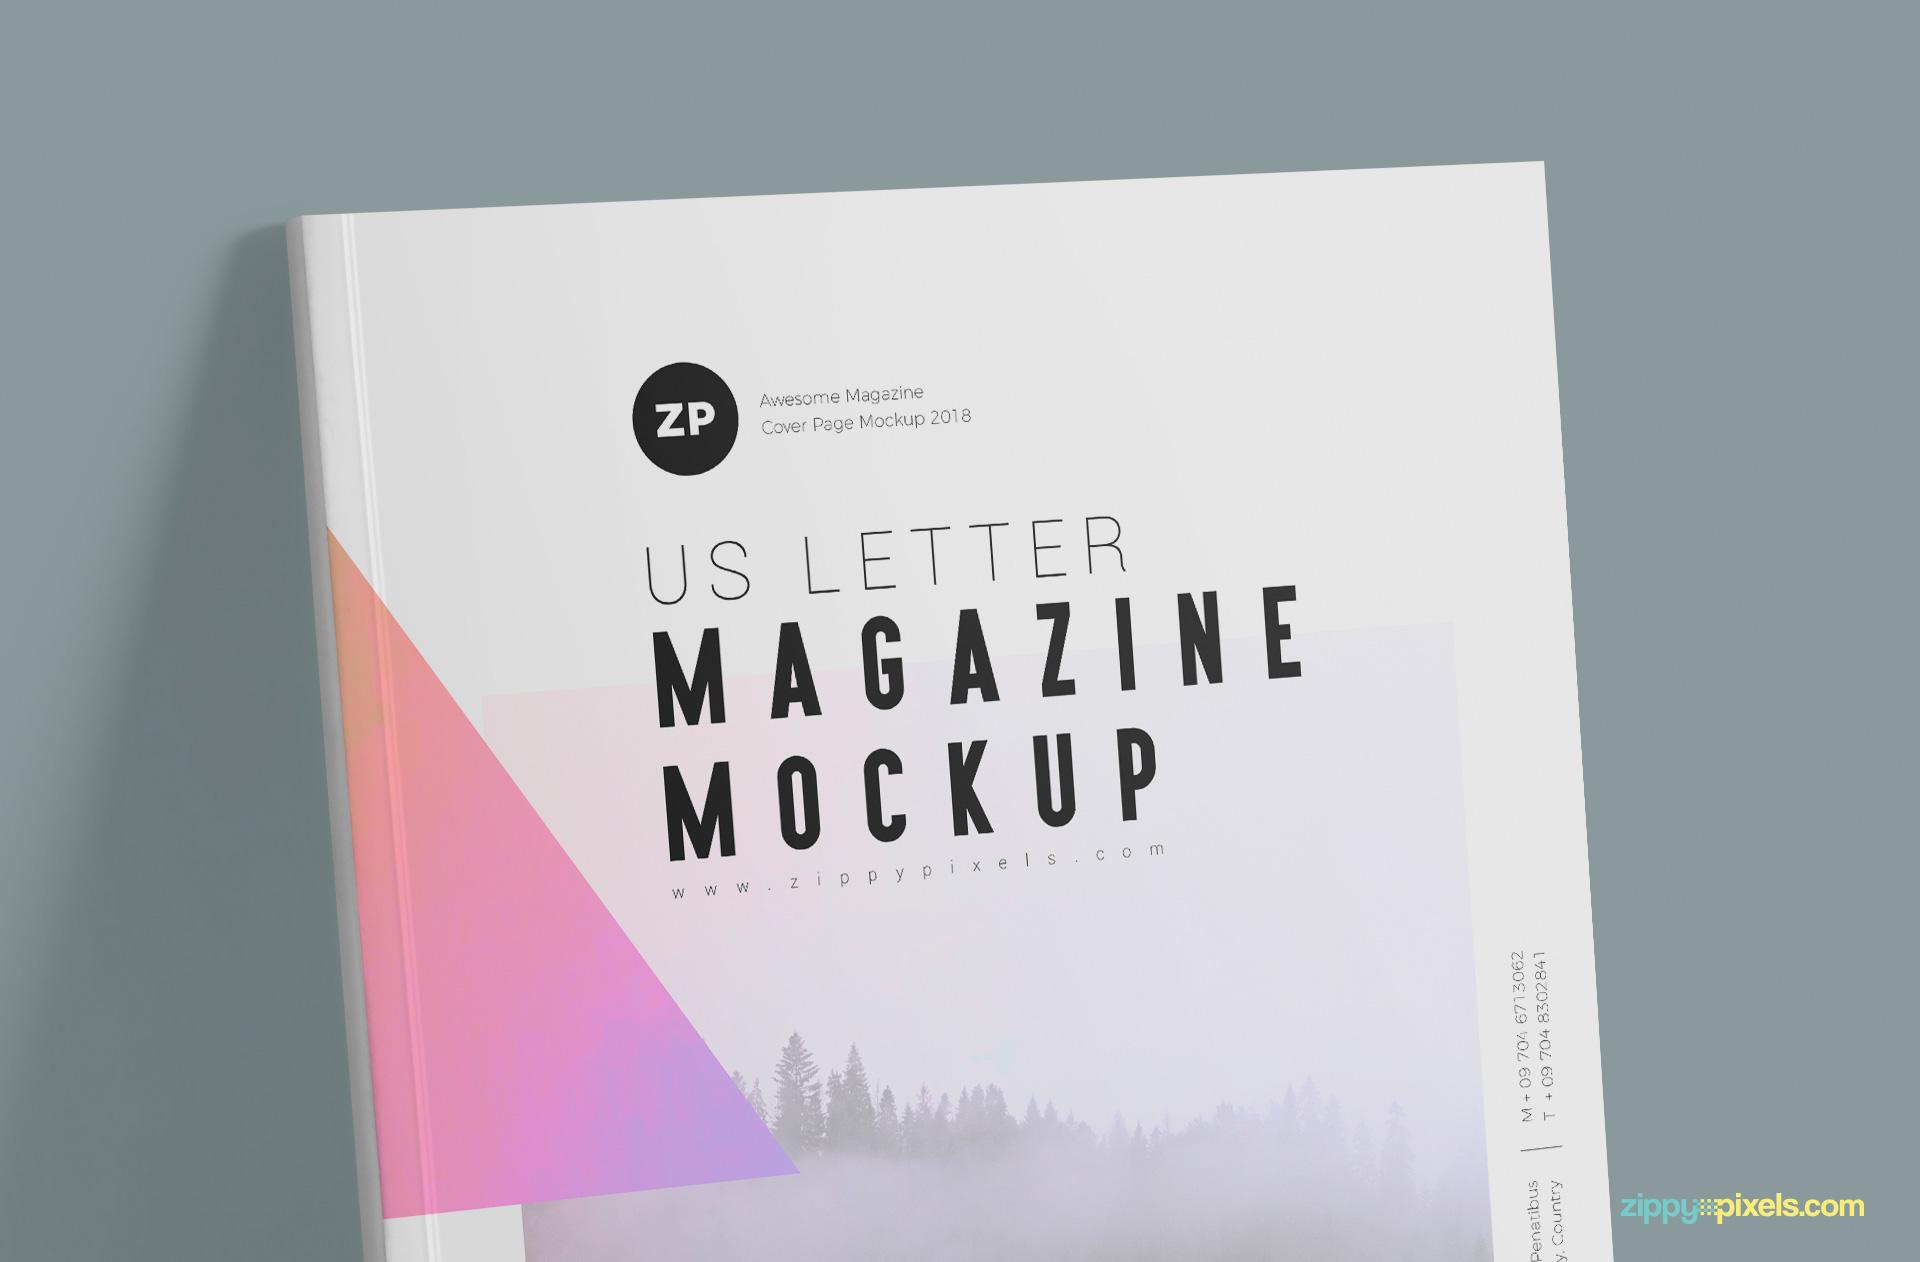 Free US Letter Magazine Mockup PSD by ZippyPixels.